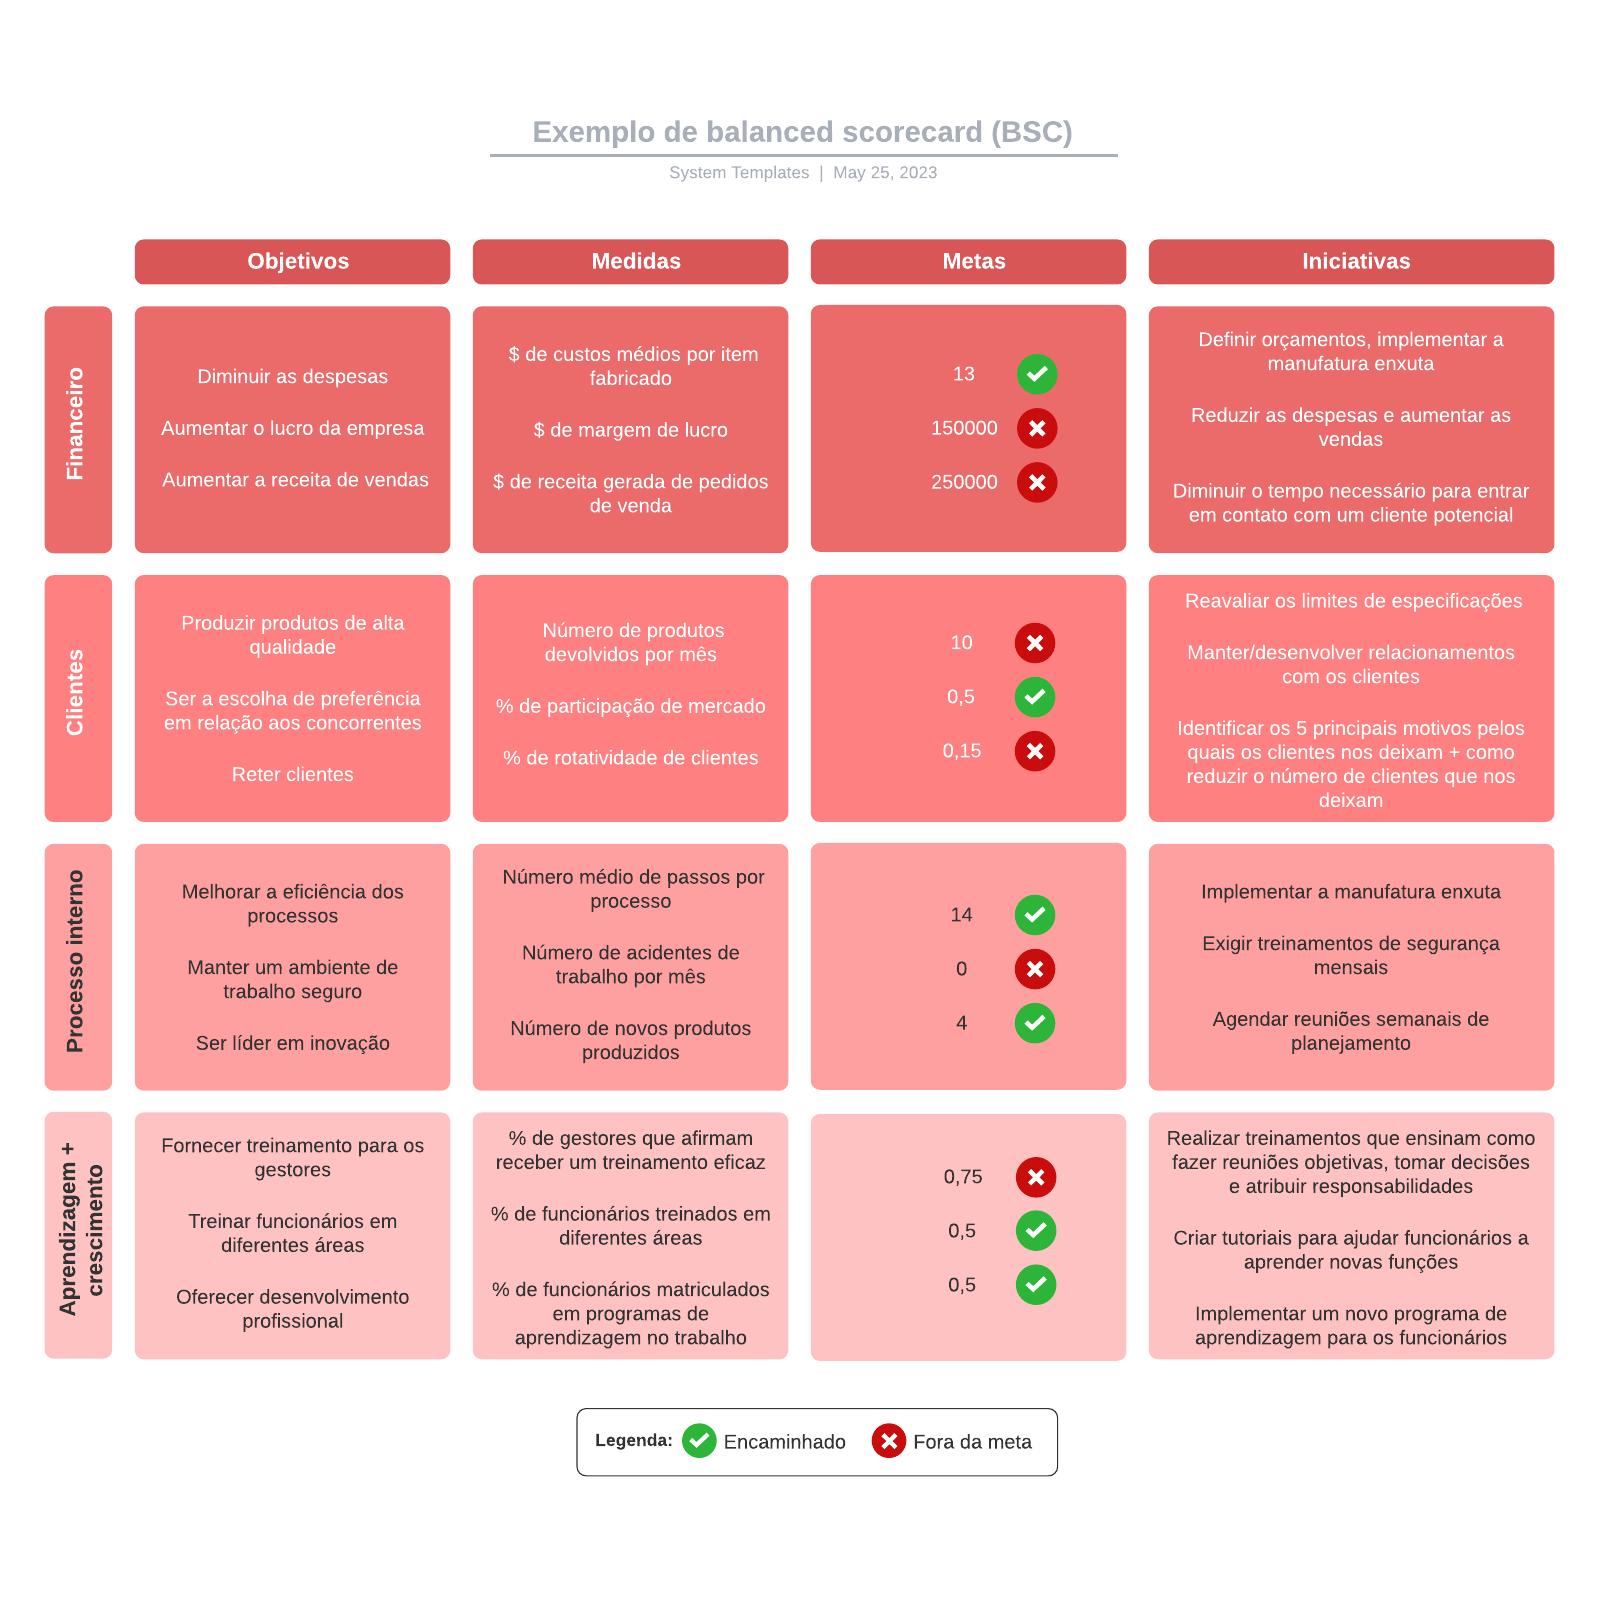 Exemplo de balanced scorecard (BSC)